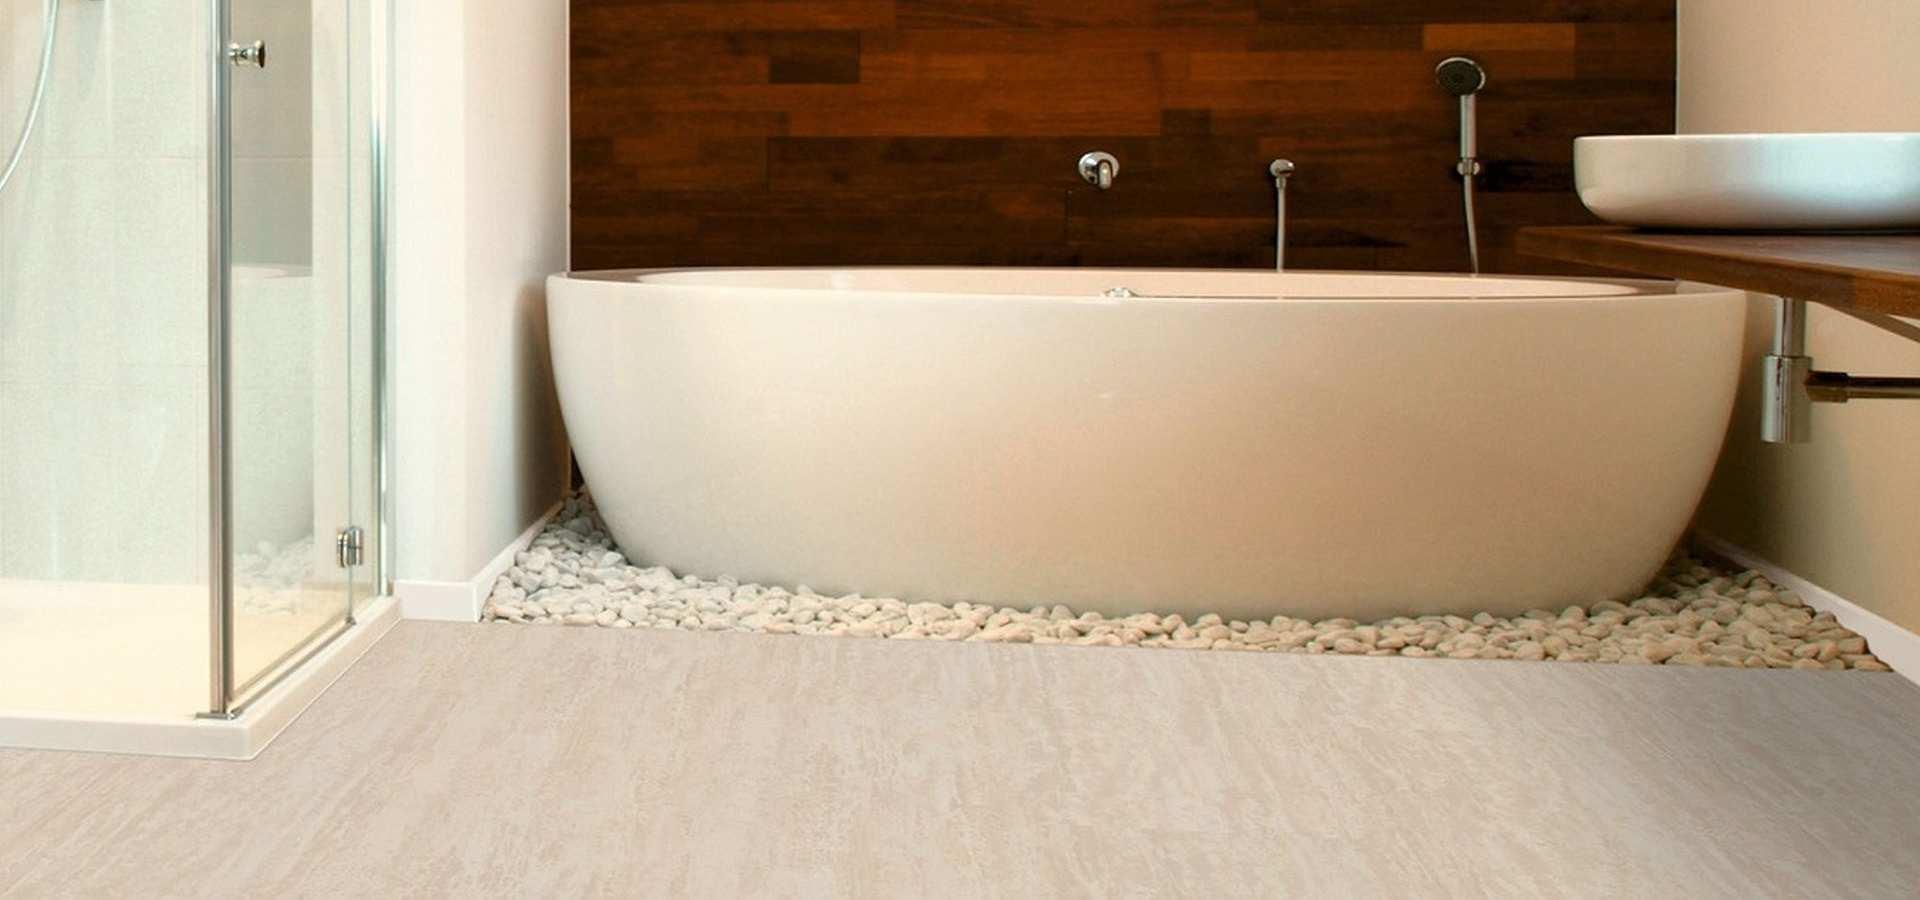 Bild Bad Vinylboden marmor beige